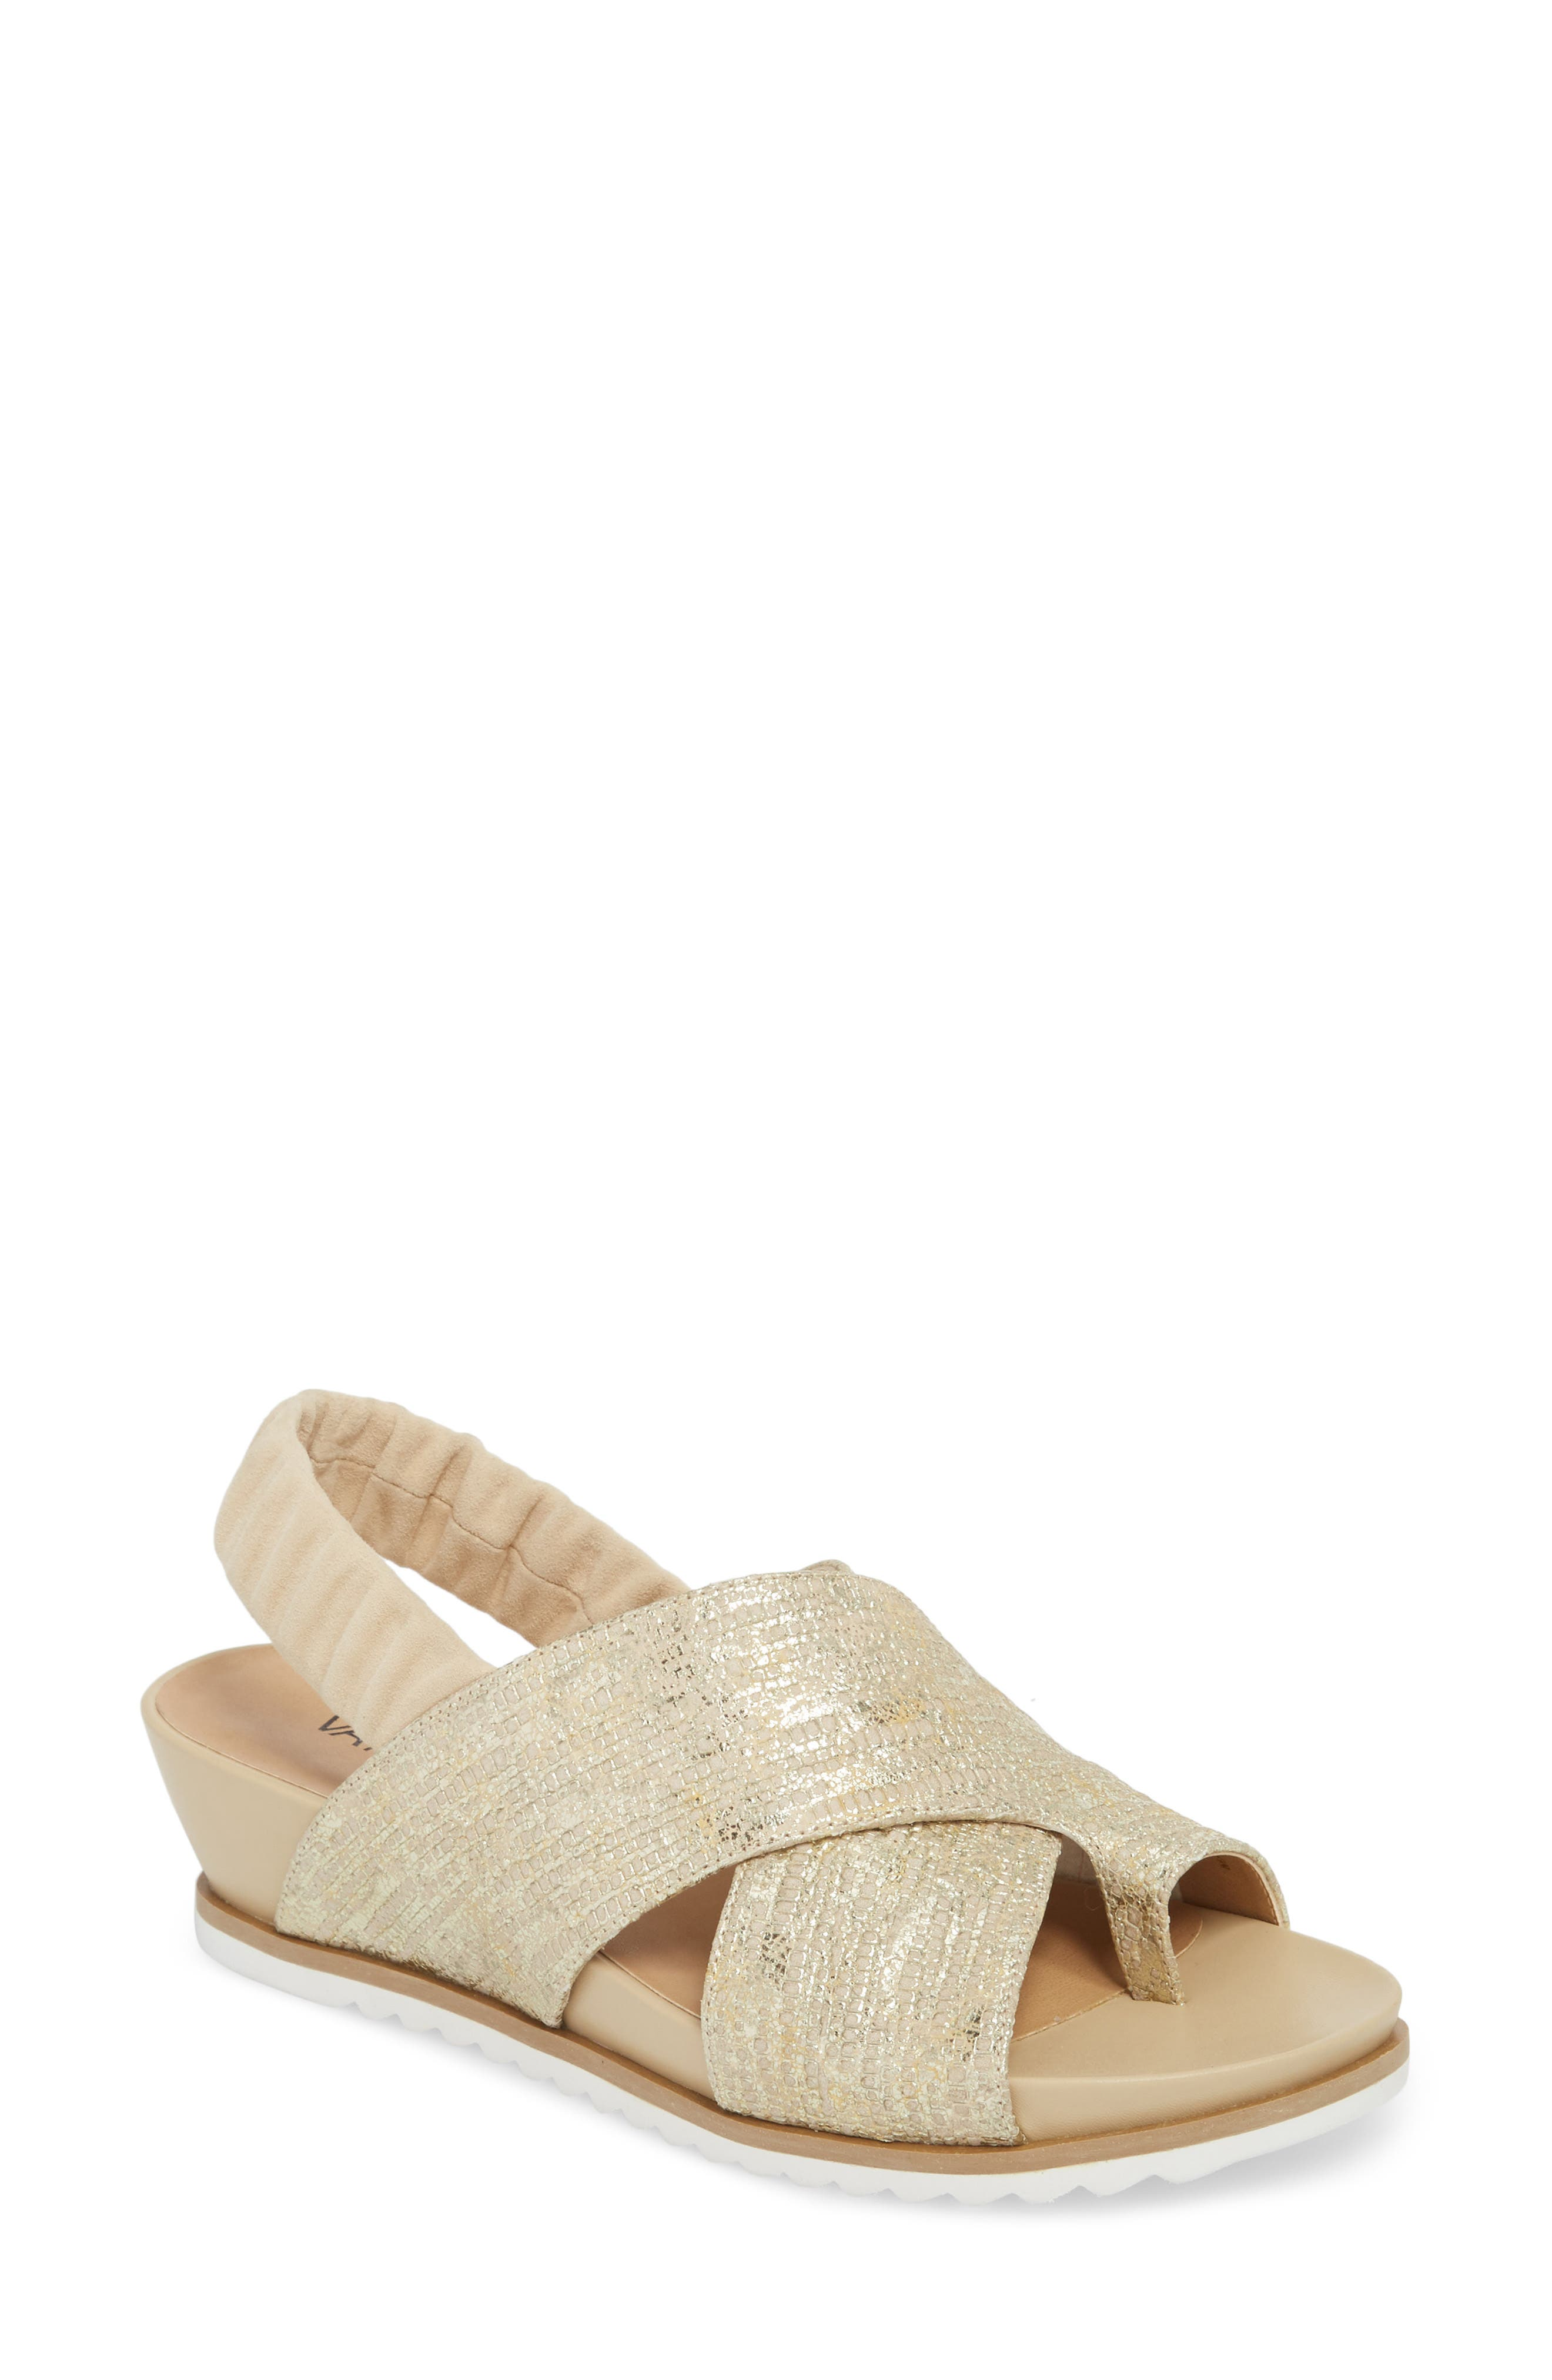 Hendra Slingback Sandal,                         Main,                         color, Beige Printed Leather